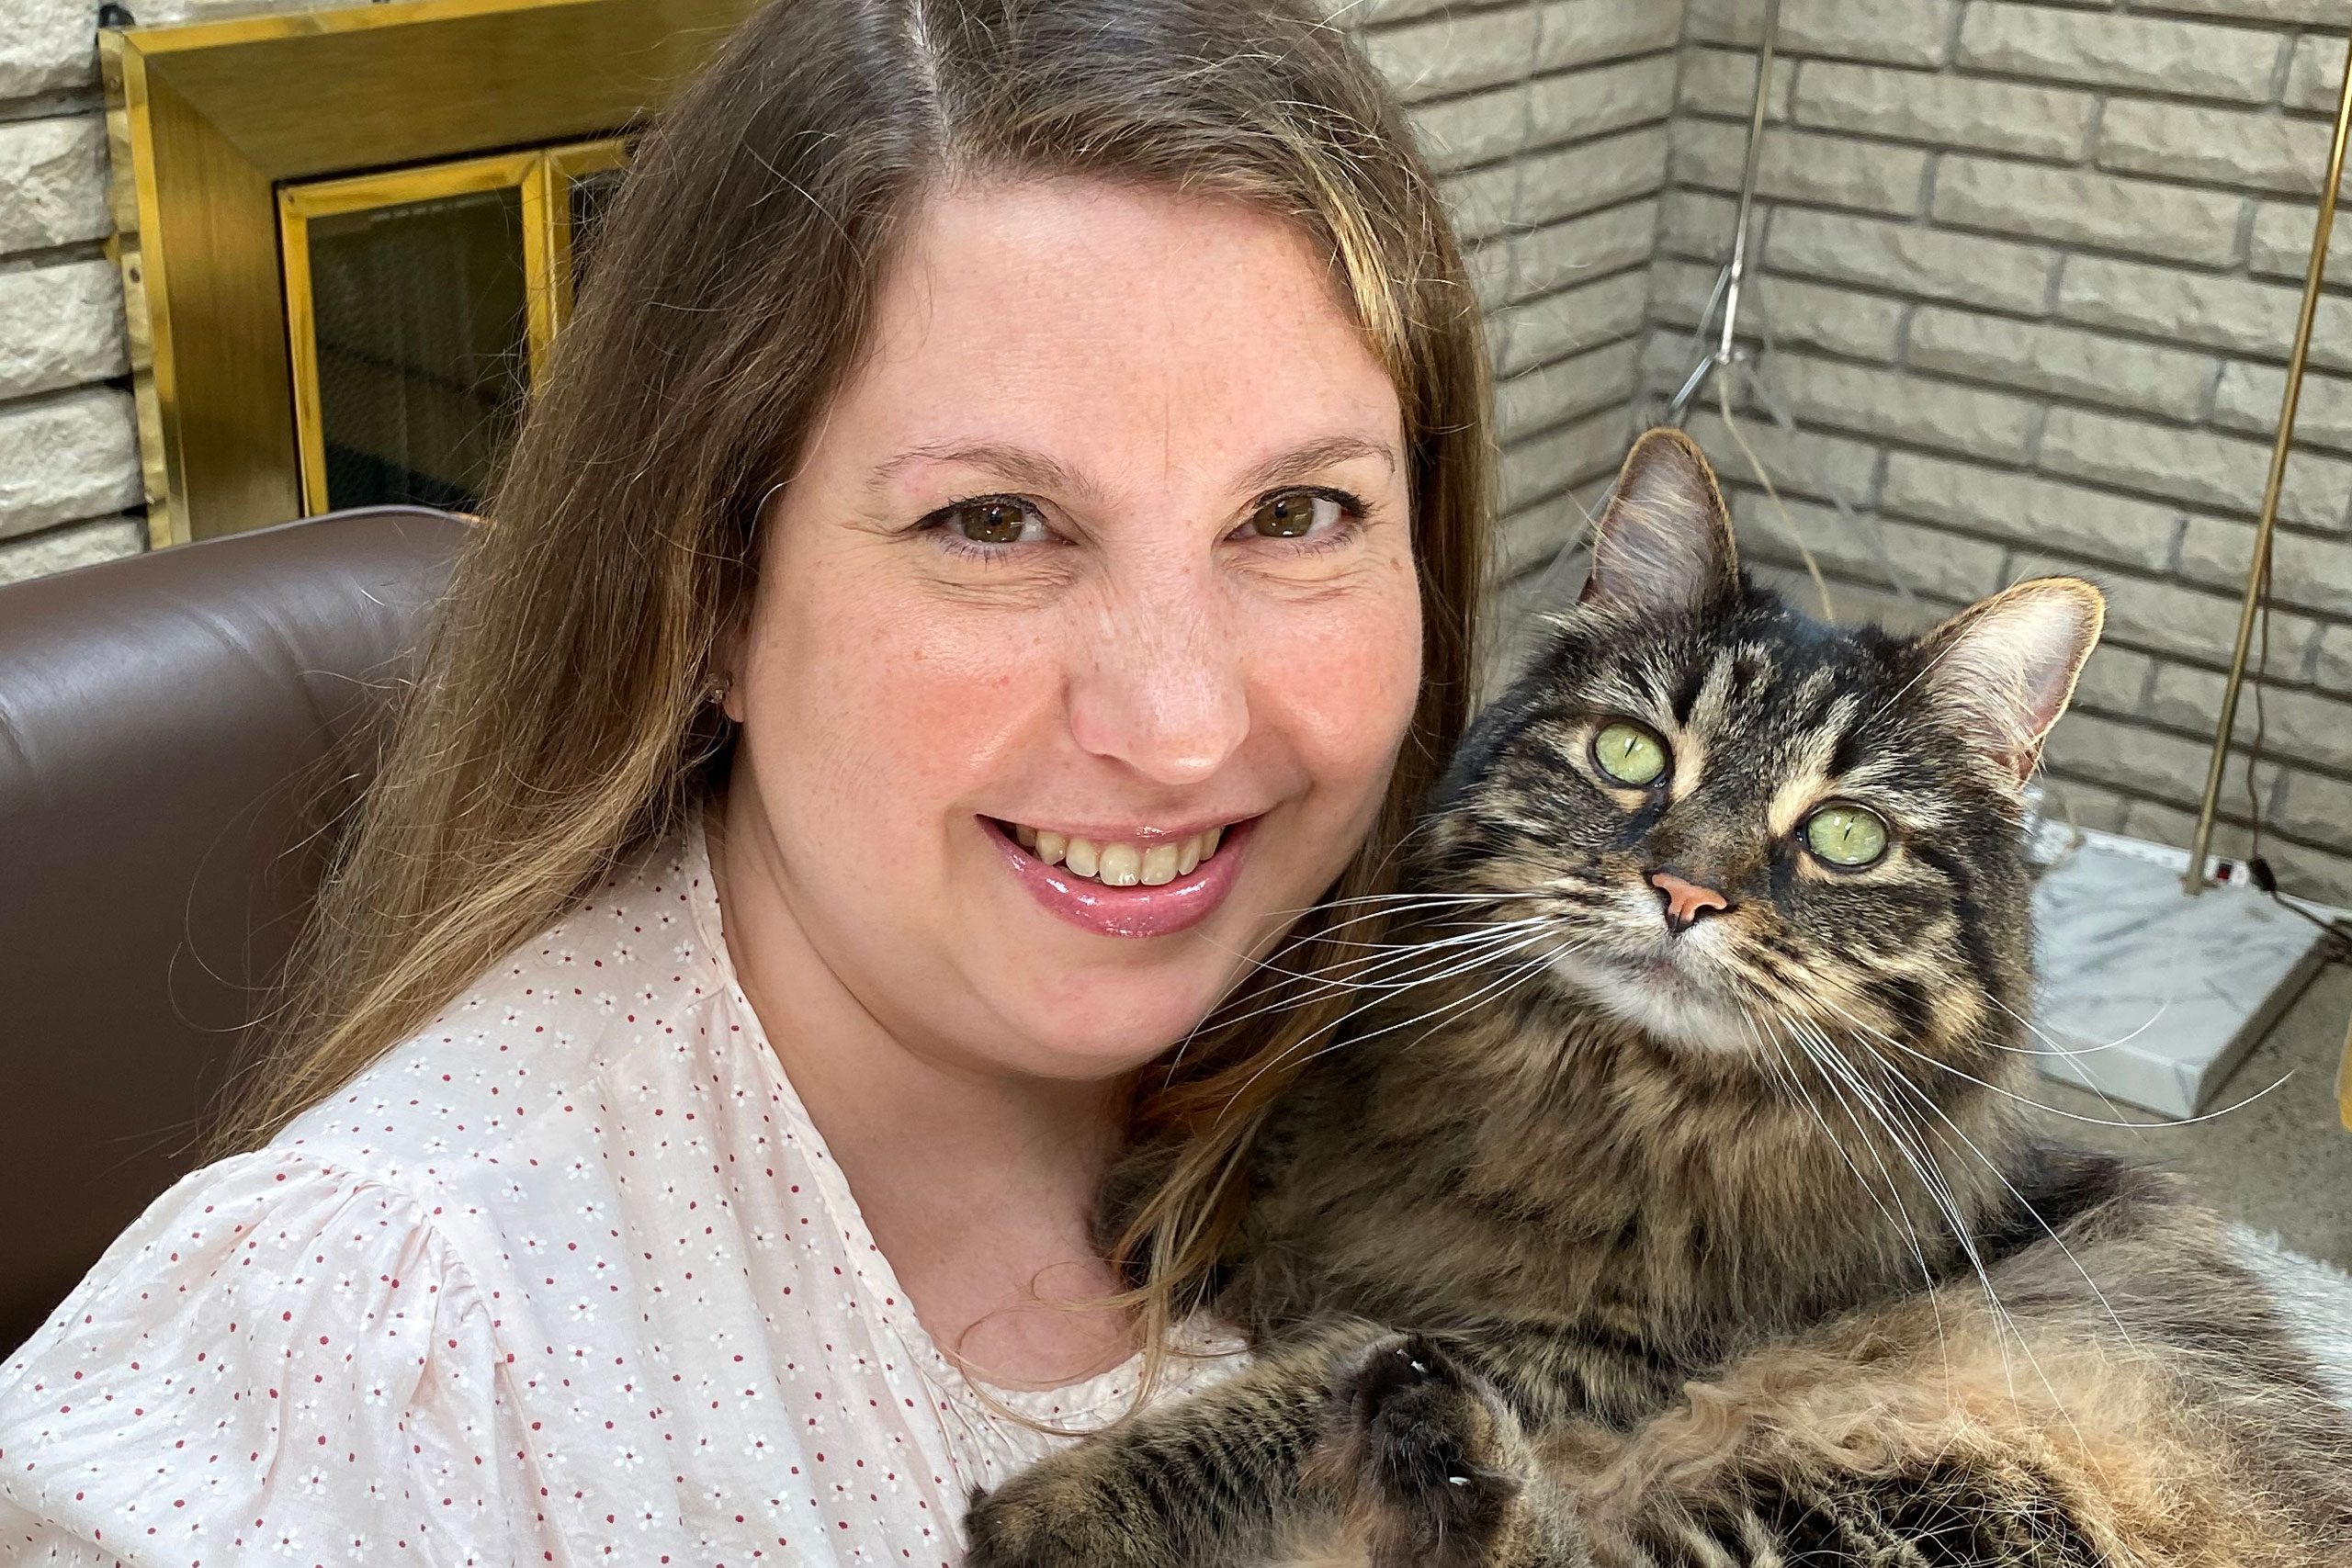 Melisssa Wasilewski and her new cat, Fiona